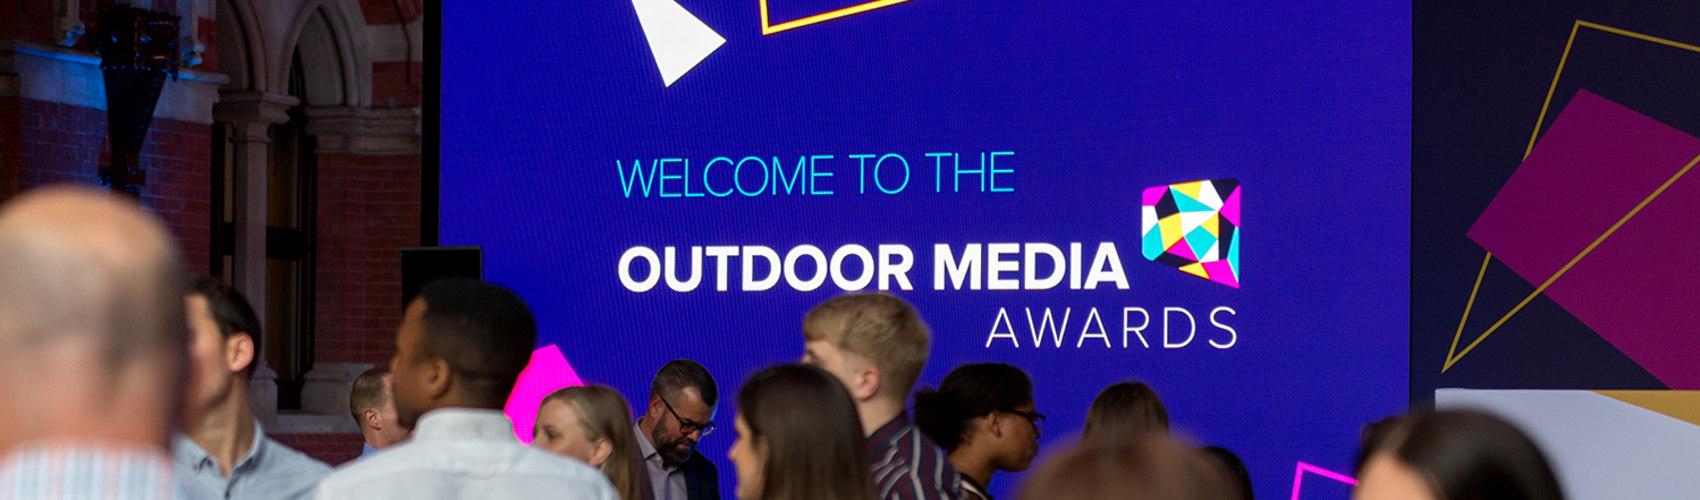 Outdoor Media Awards guests